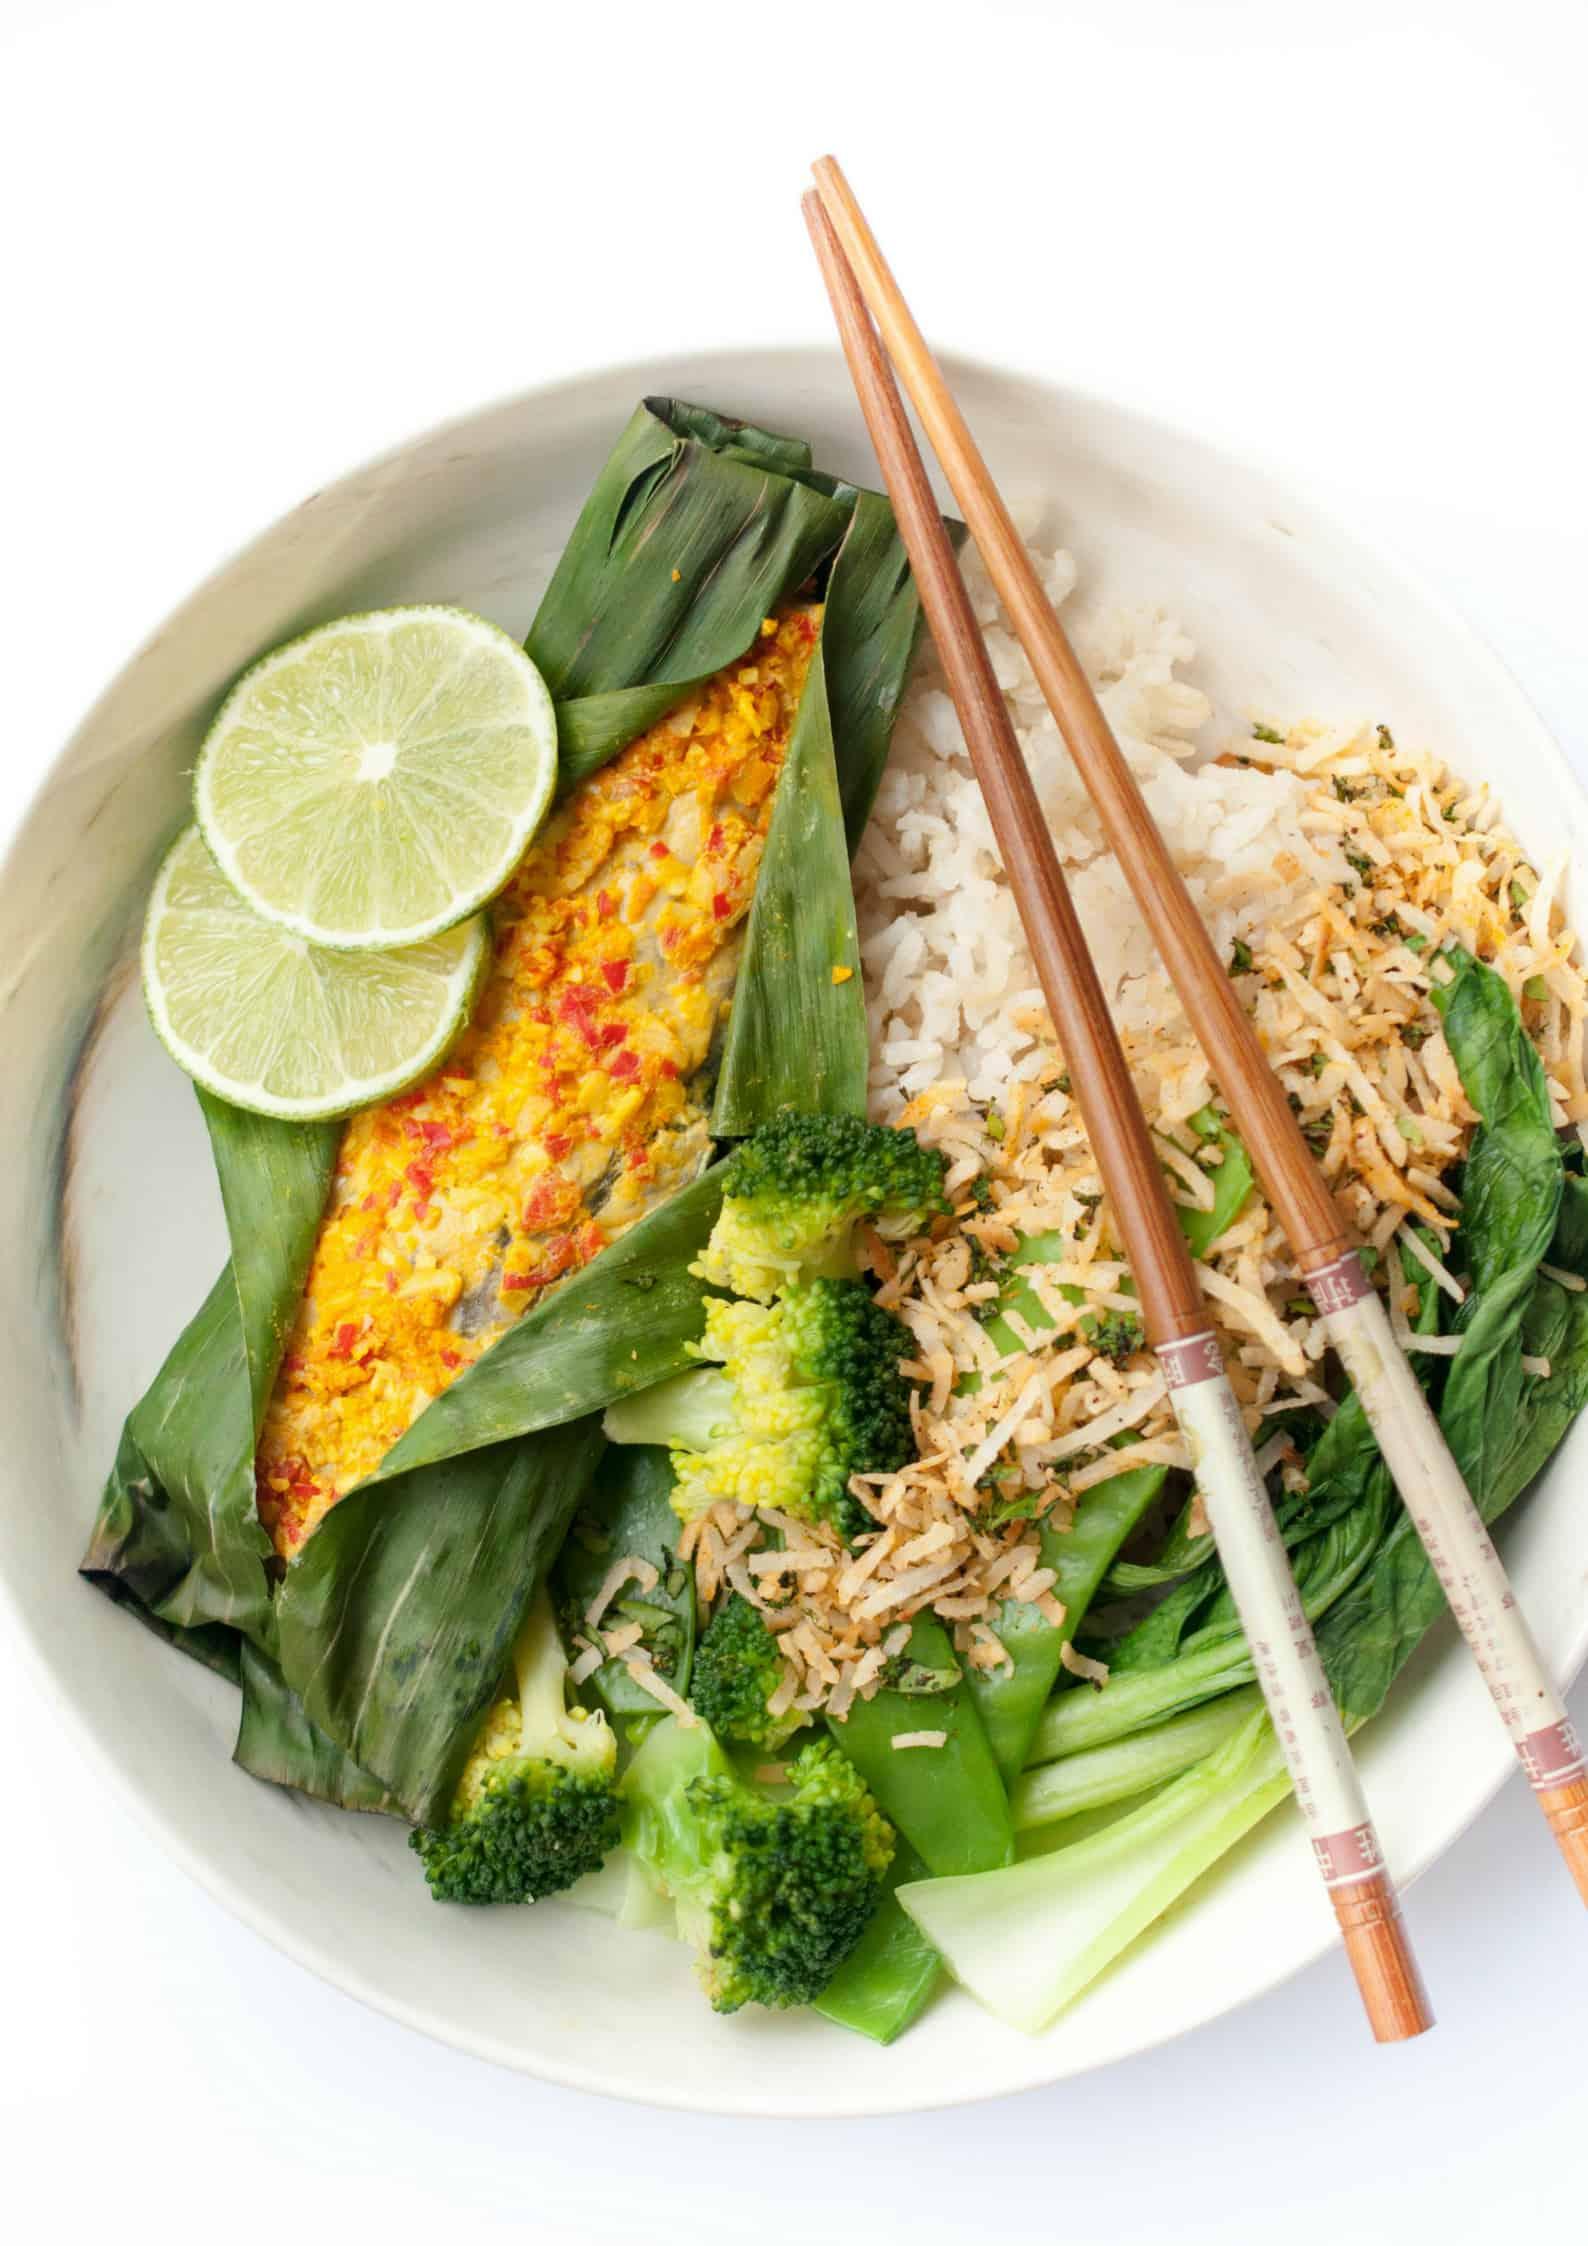 Turmeric Lemongrass Fish with Coconut Rice